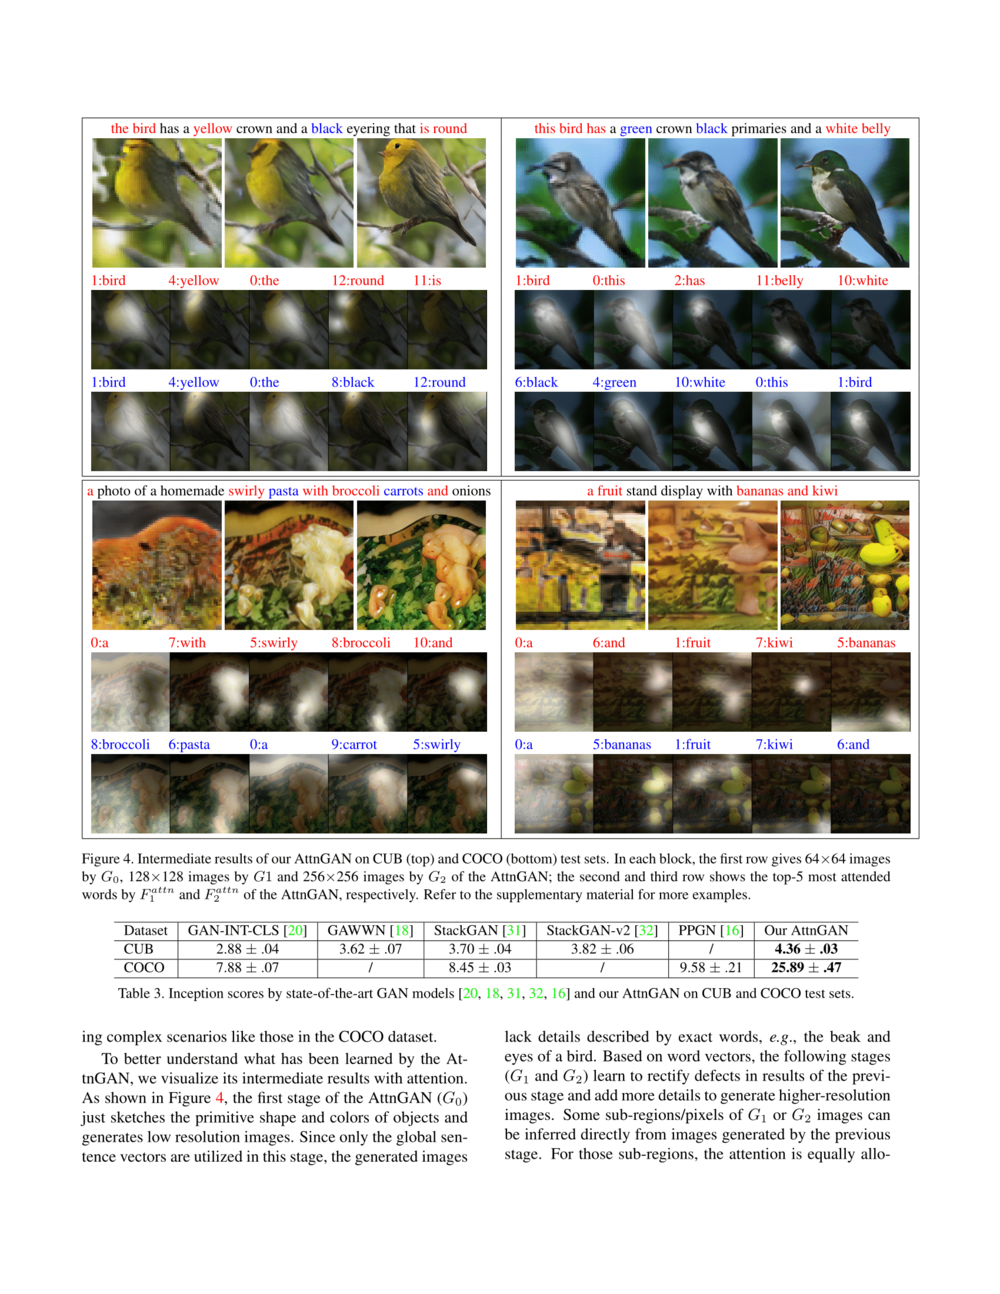 microsoft-researchers-build-a-bot-that-draws.001-7.png